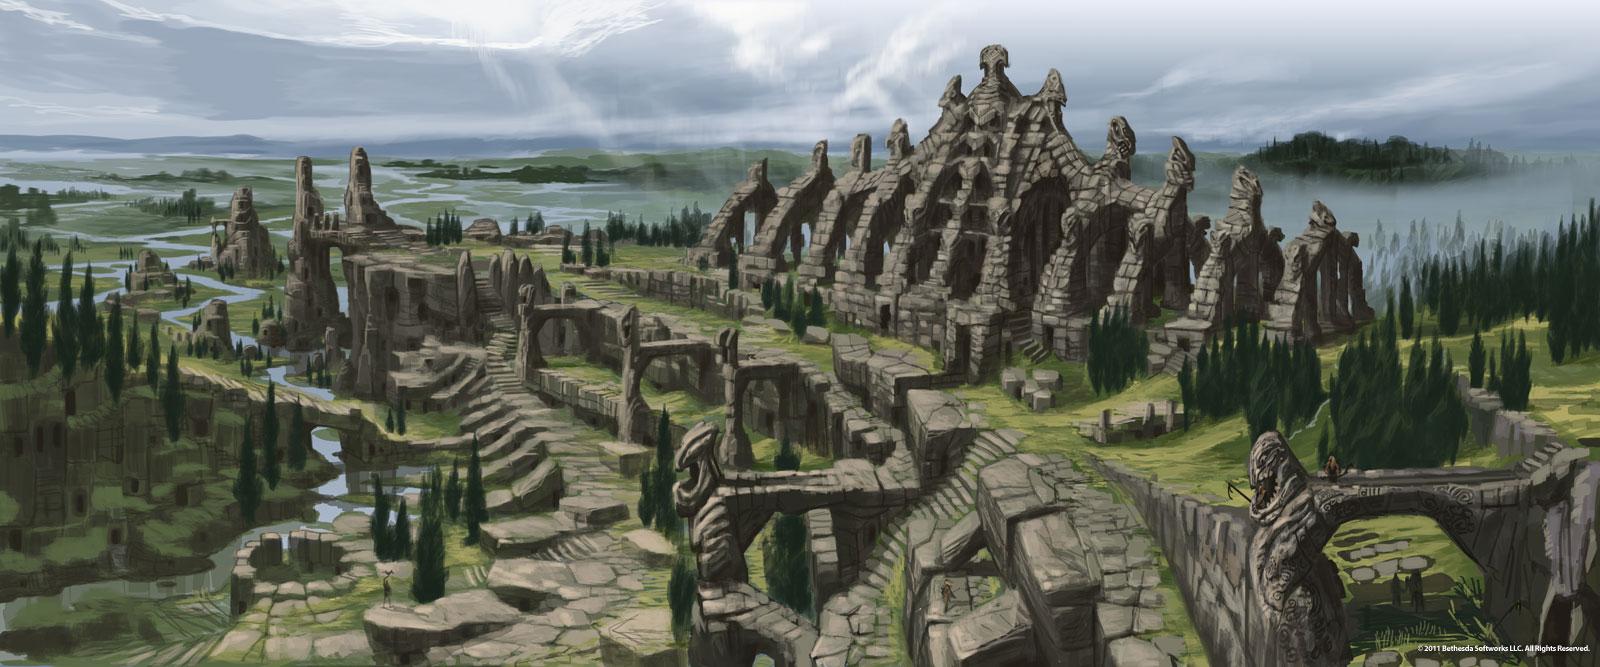 Nordic Ruins. Concept art by Adam Adamowicz.